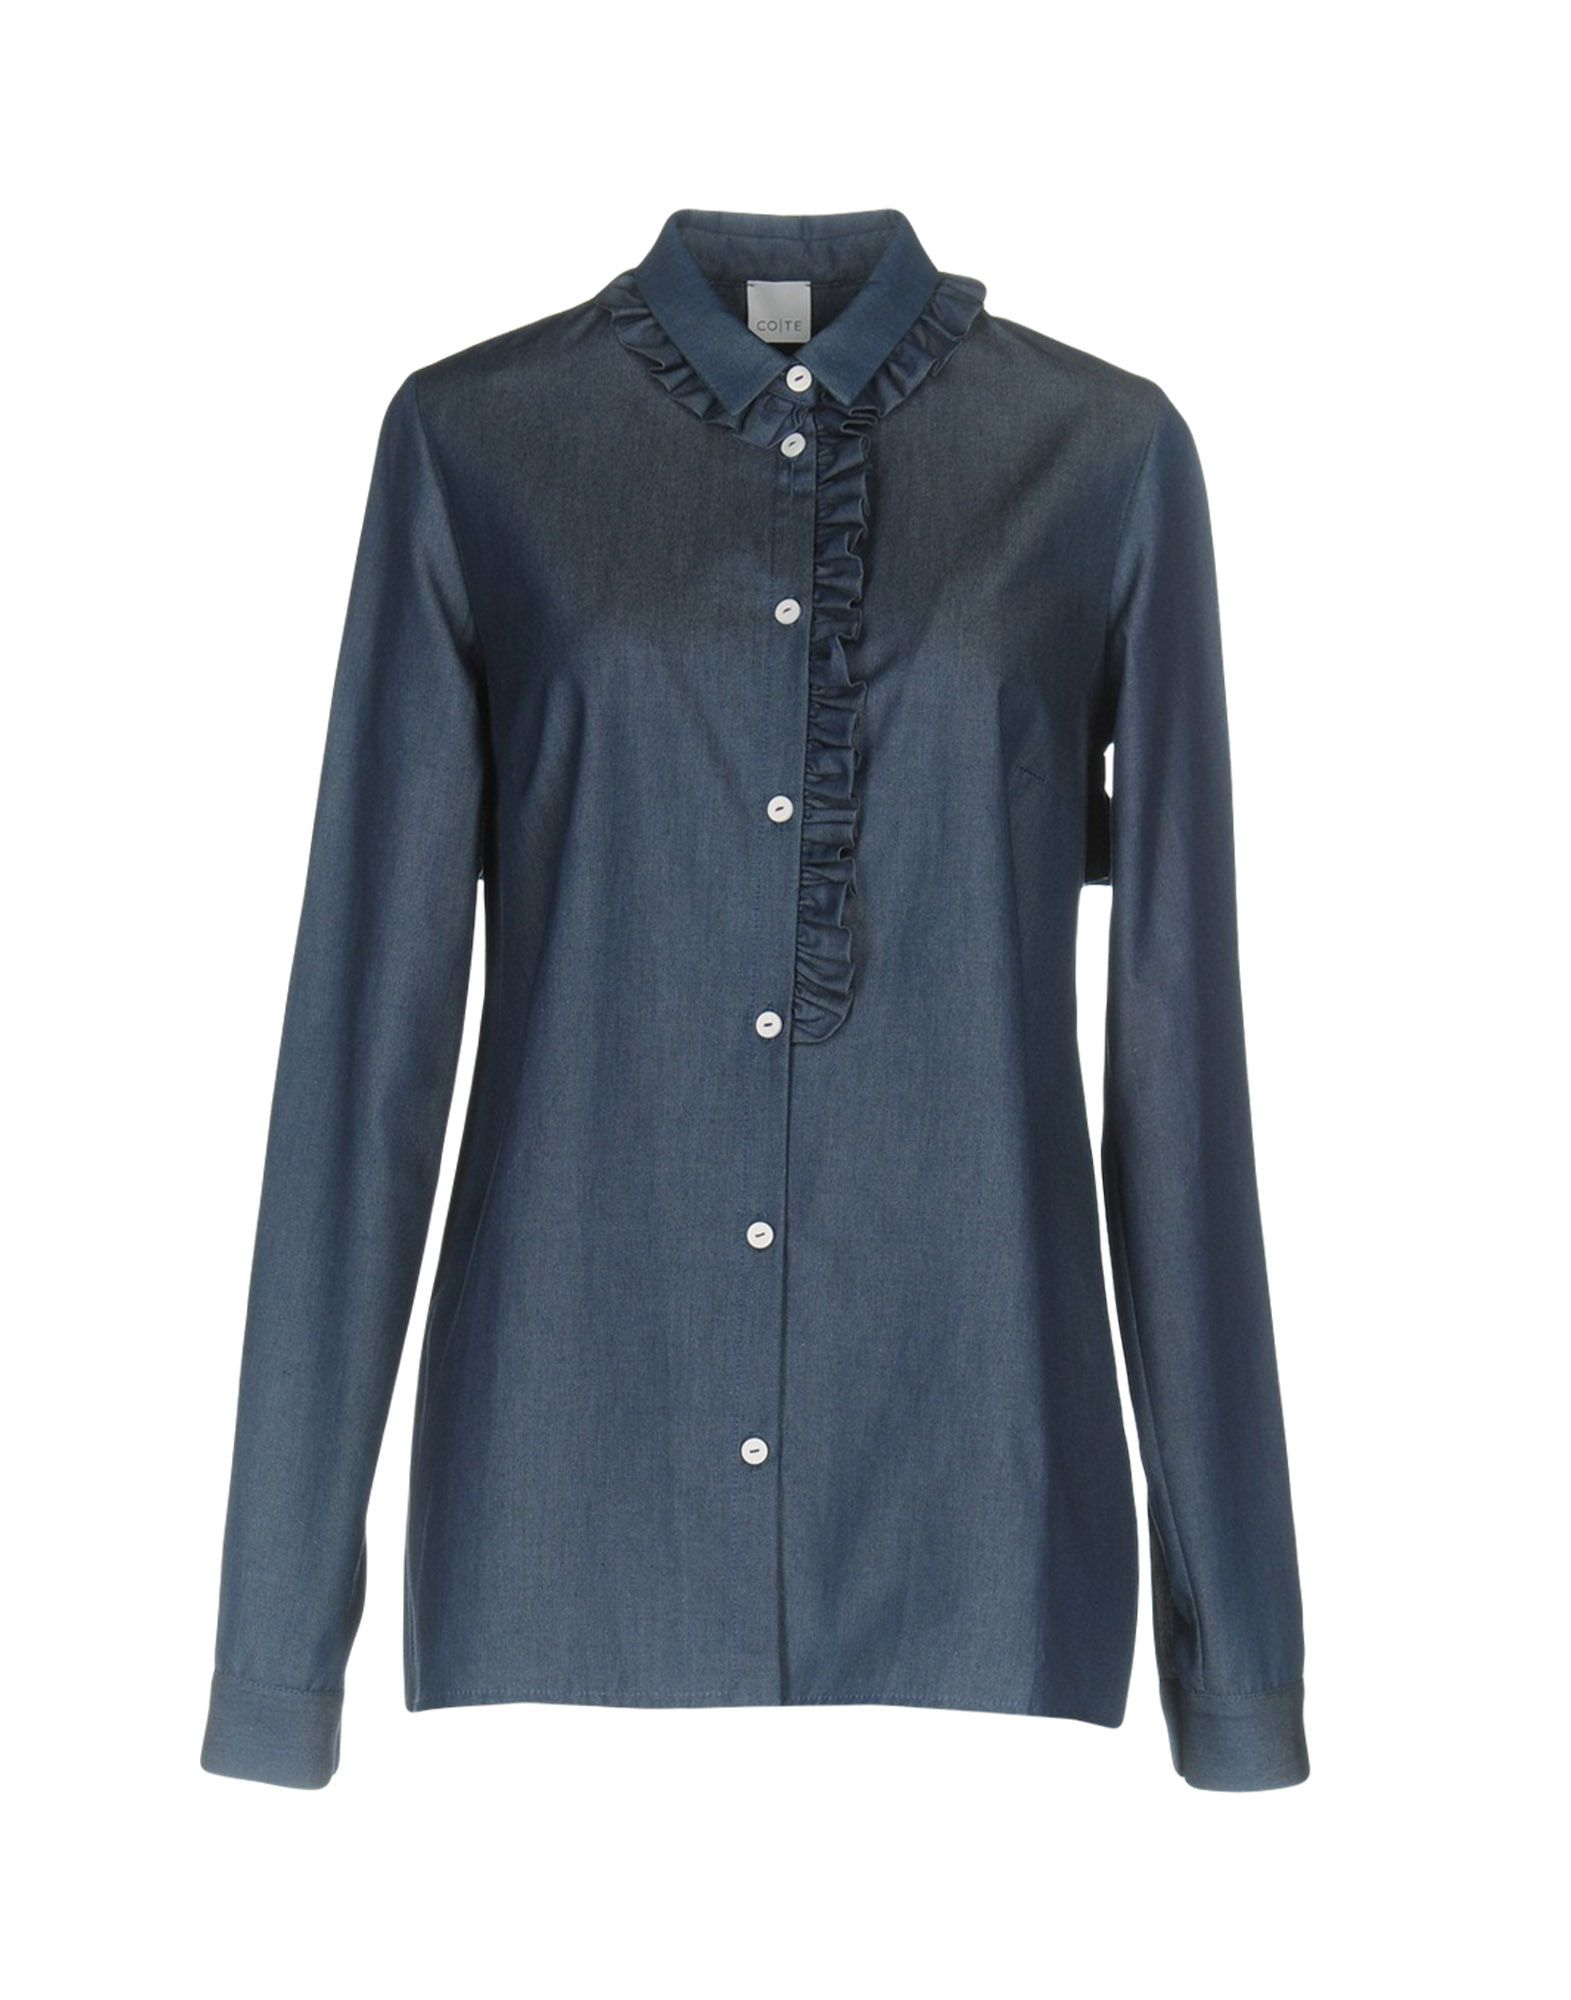 CO|TE Джинсовая рубашка at p co рубашка джинсовая атипико franciacpb33 0915 синий 42